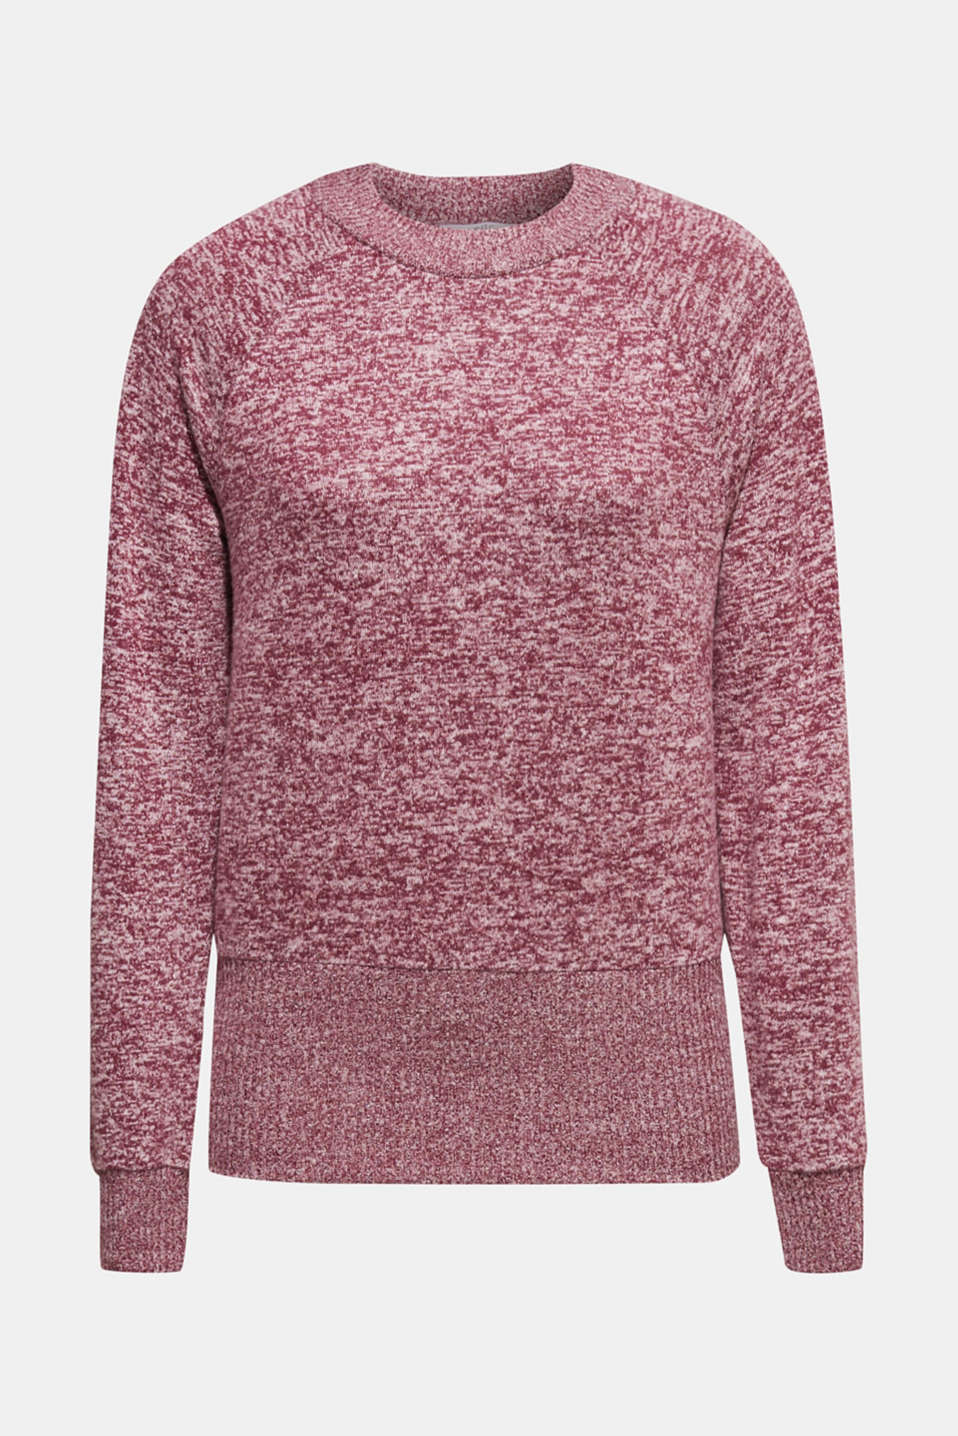 Fluffy sweatshirt in a melange finish, BORDEAUX RED 5, detail image number 6